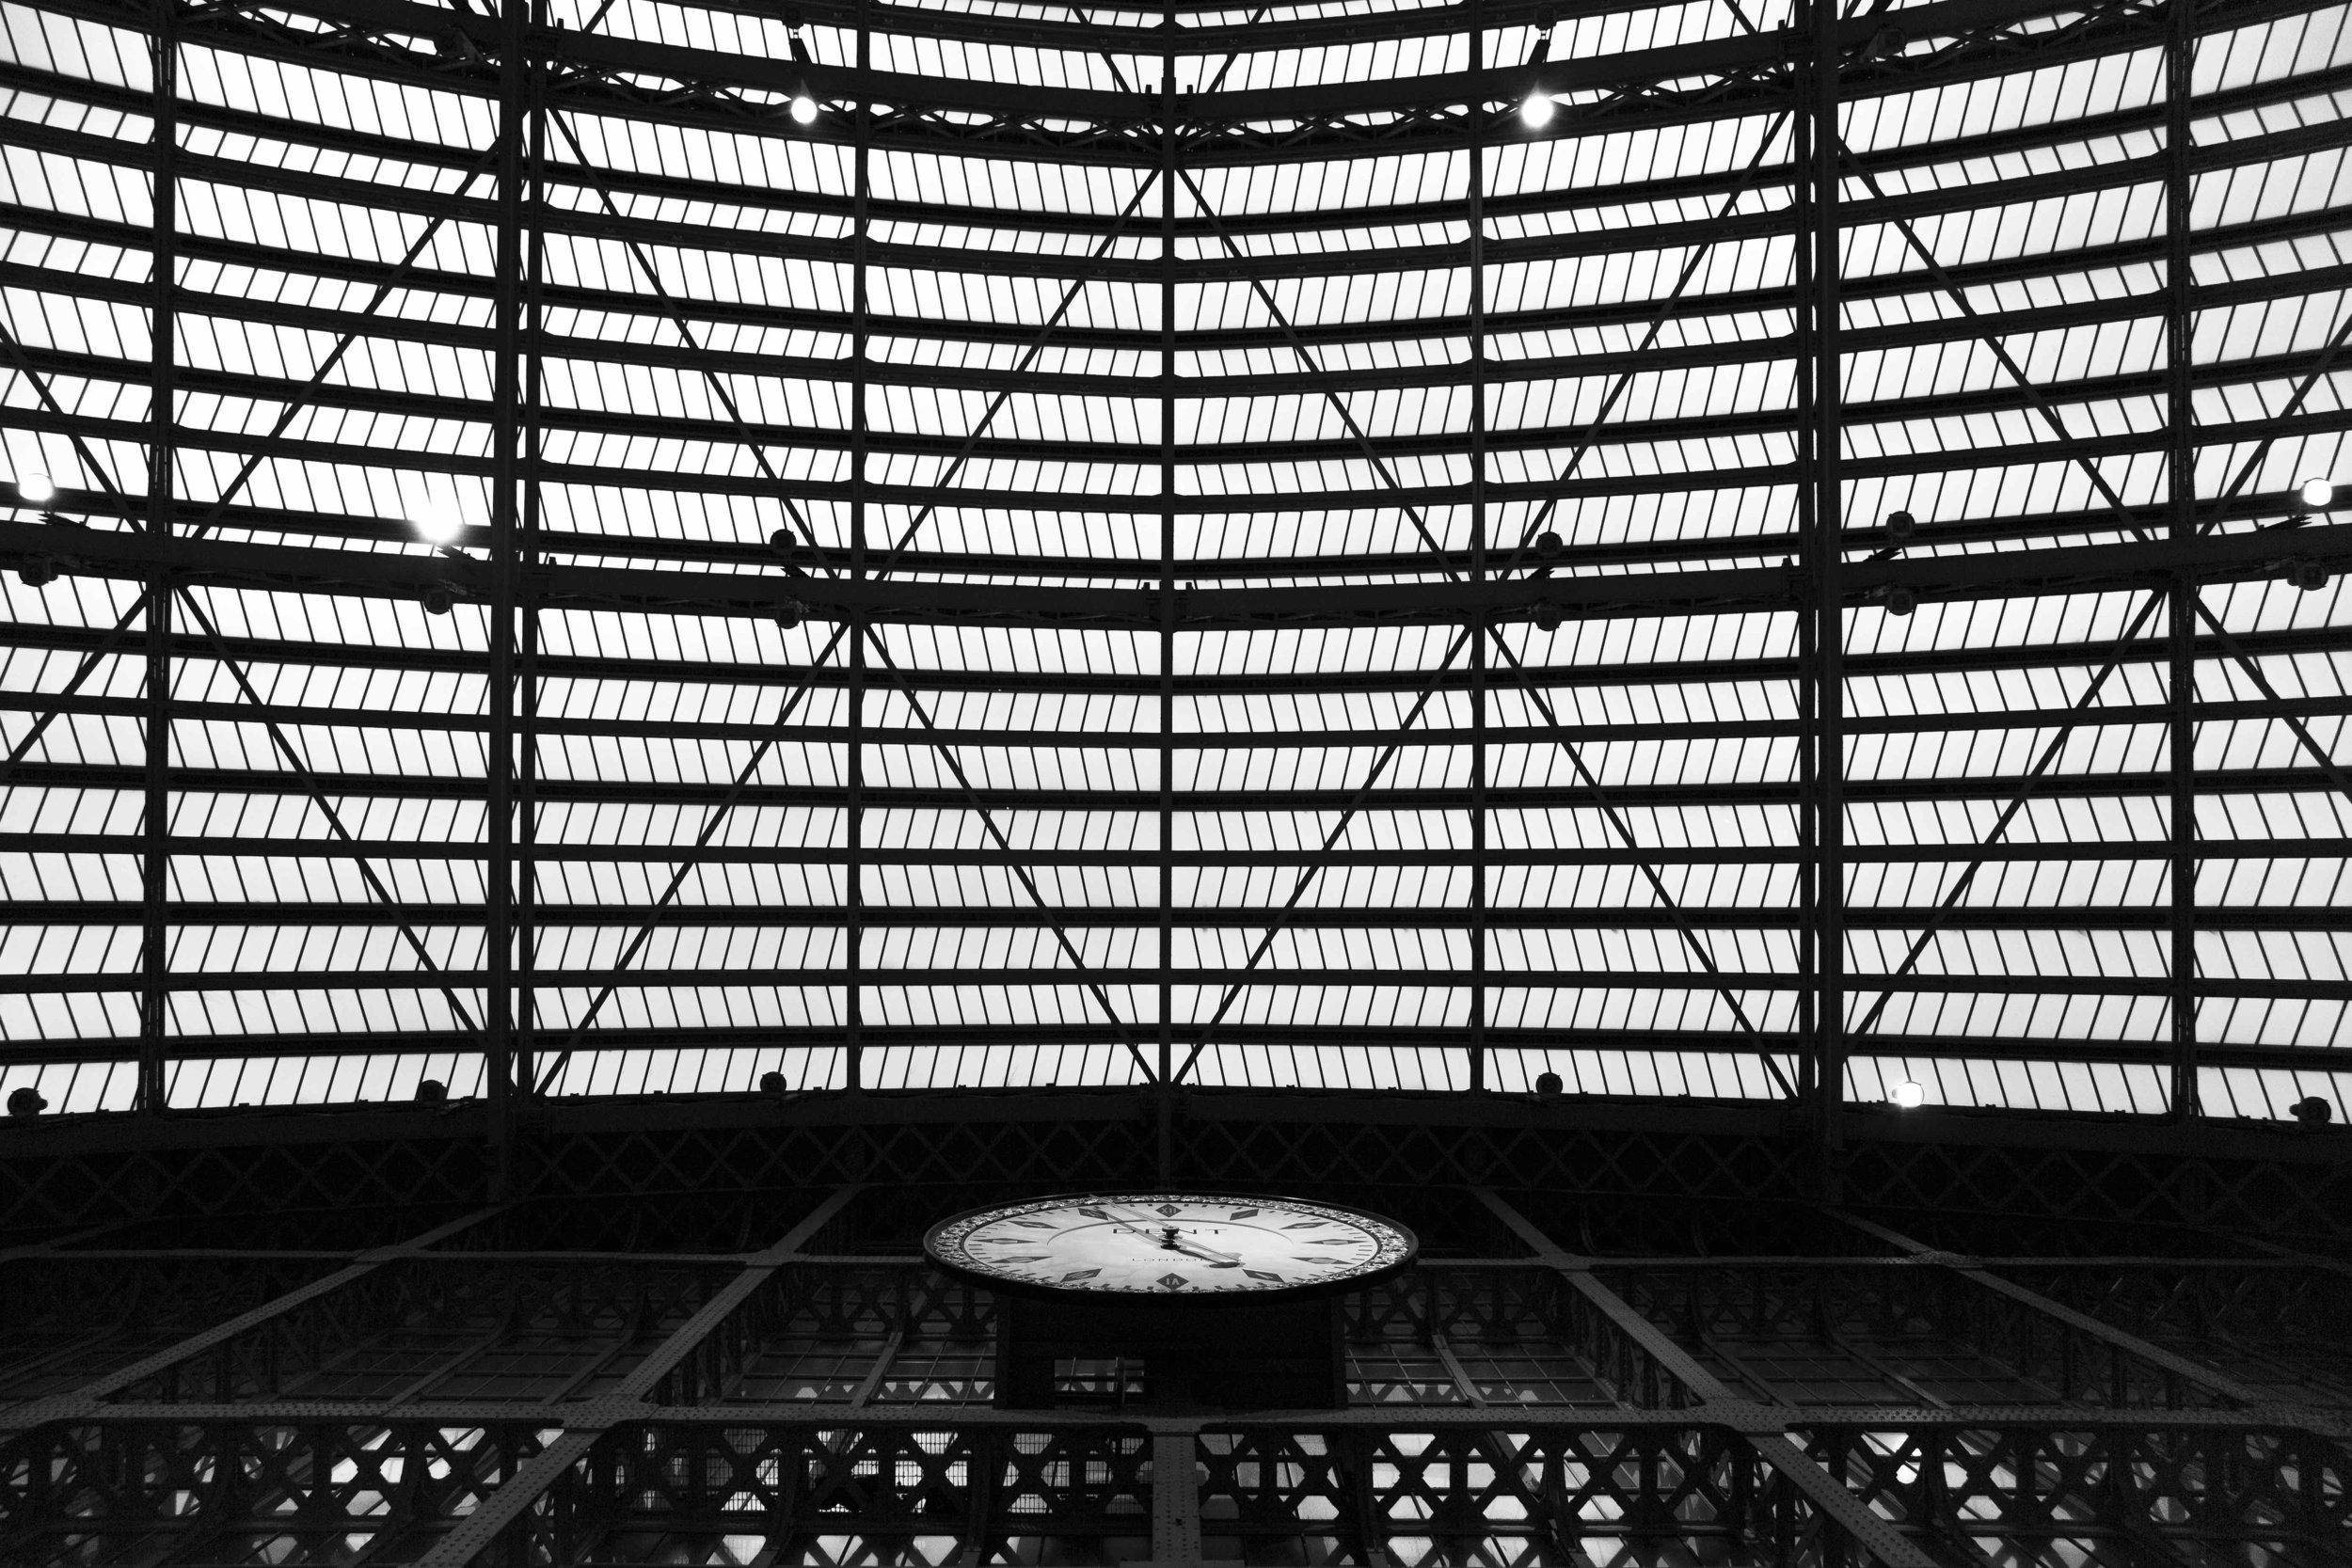 fabio_burrelli_street_photography_architecture_london_CP5B1890.jpg